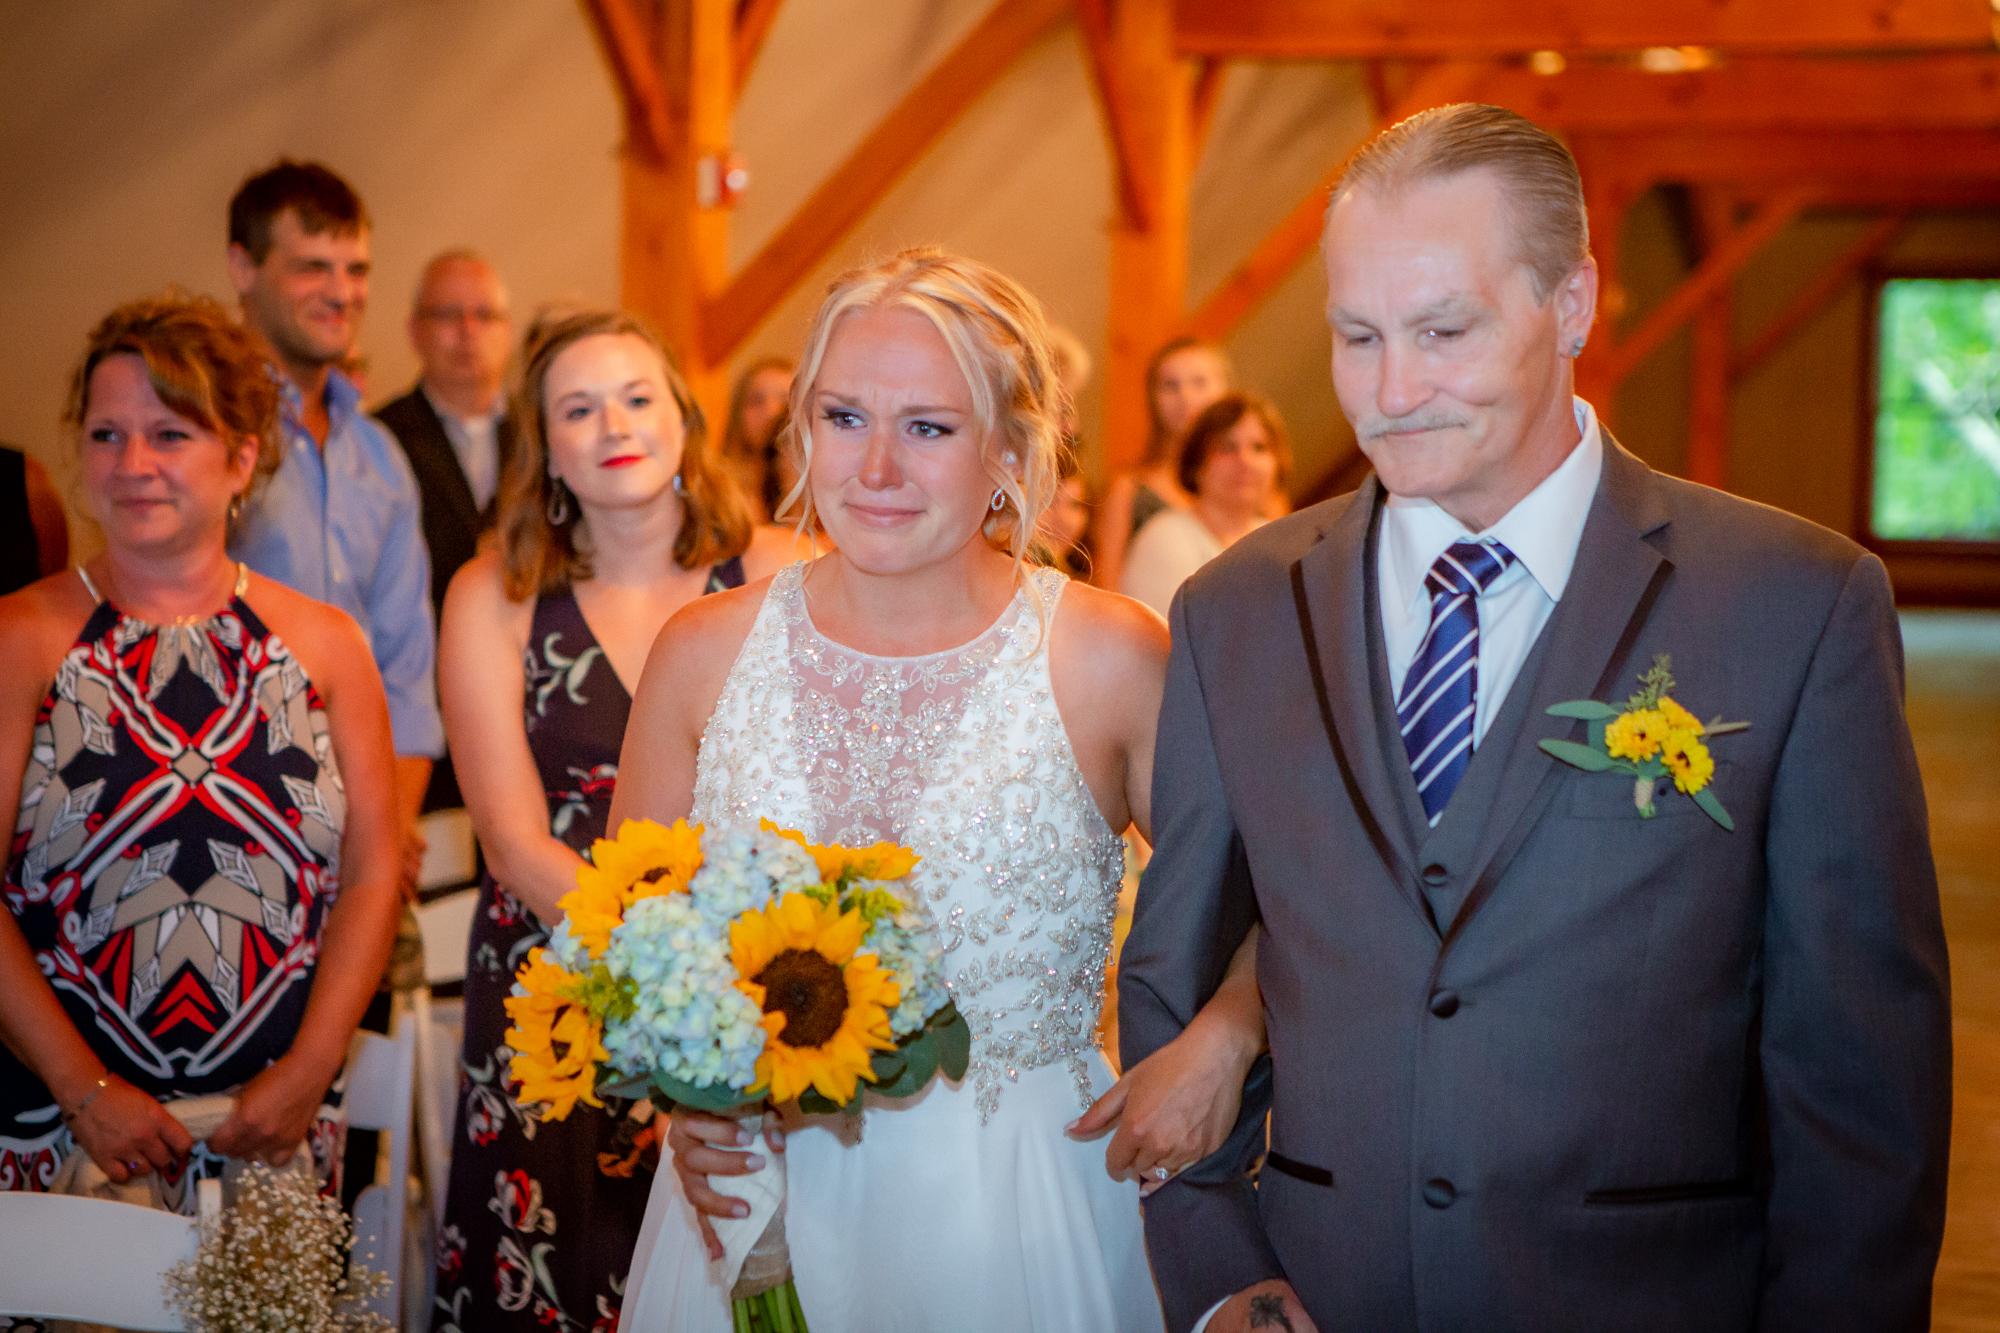 Wedding-Carriage-House-Oneonta-NY-0524.jpg